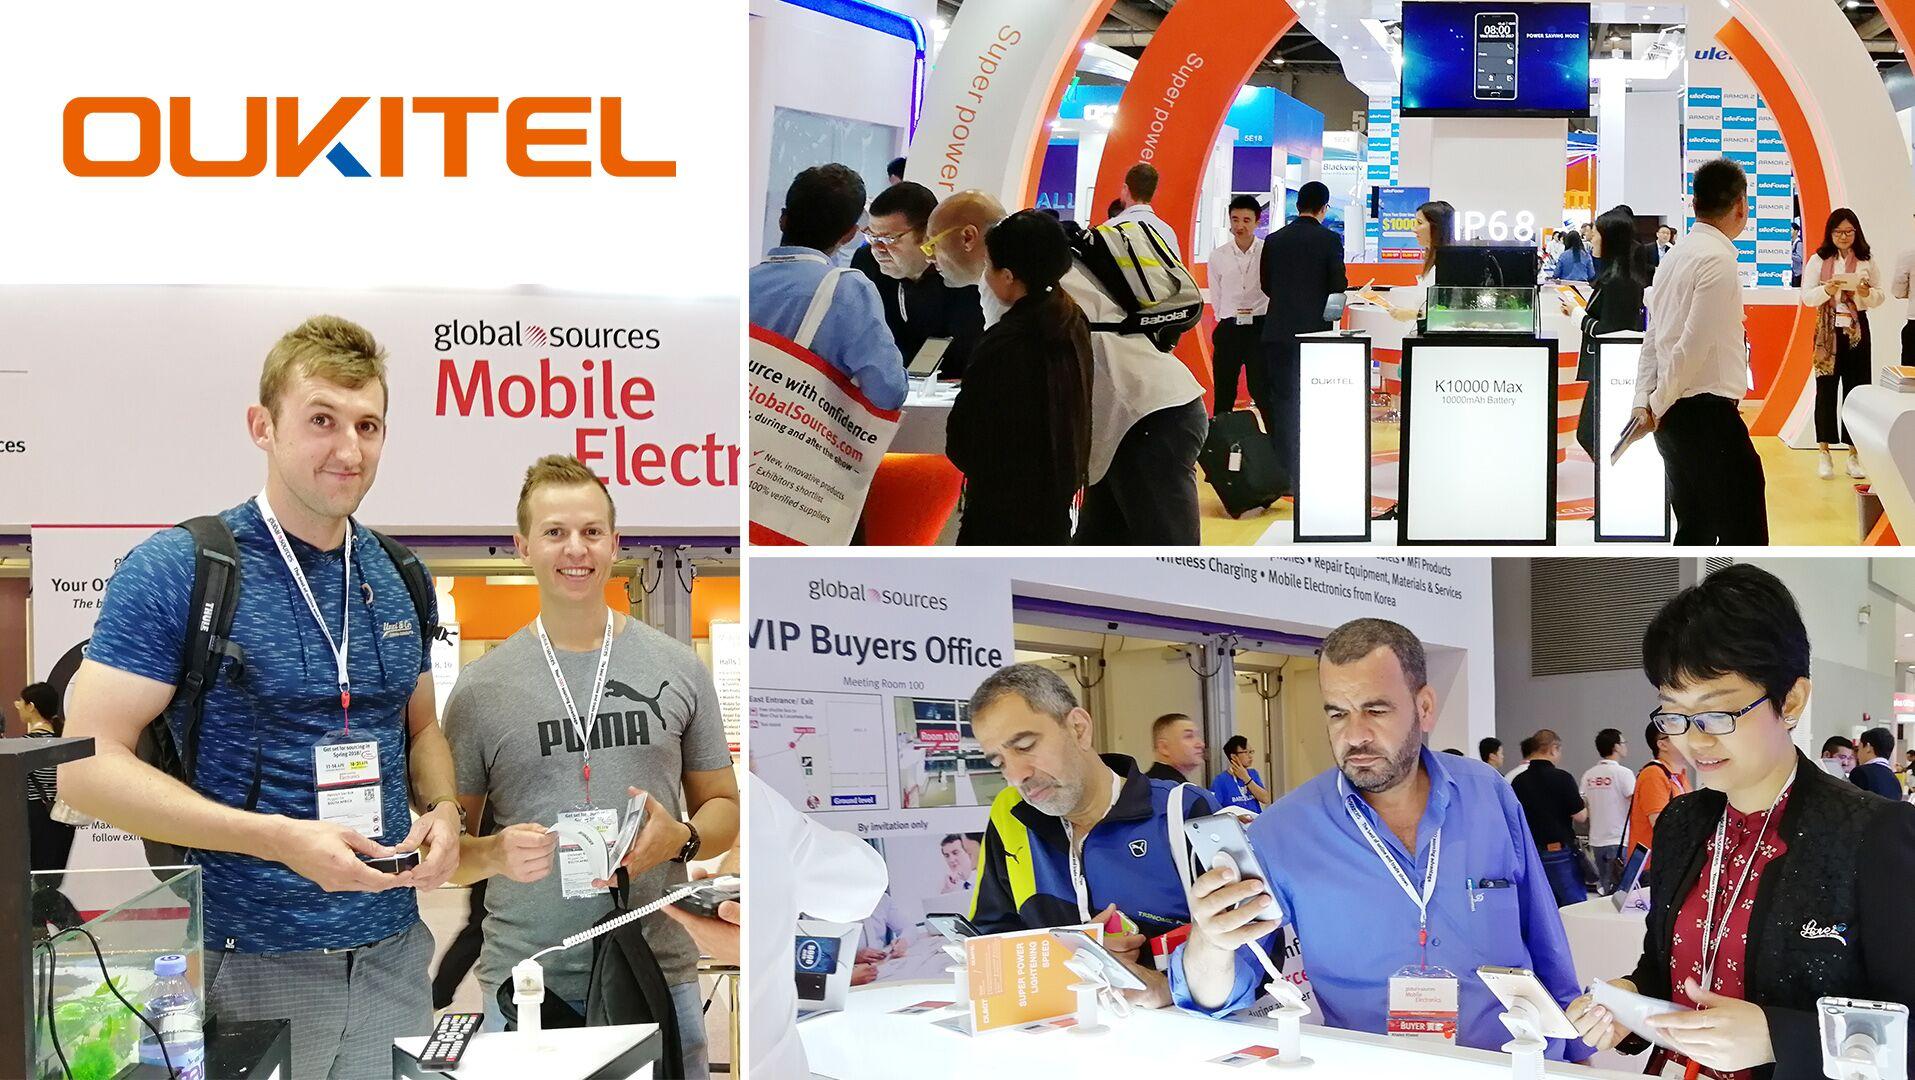 oukitel-Global-Sources-Electronics-Exhibition-03